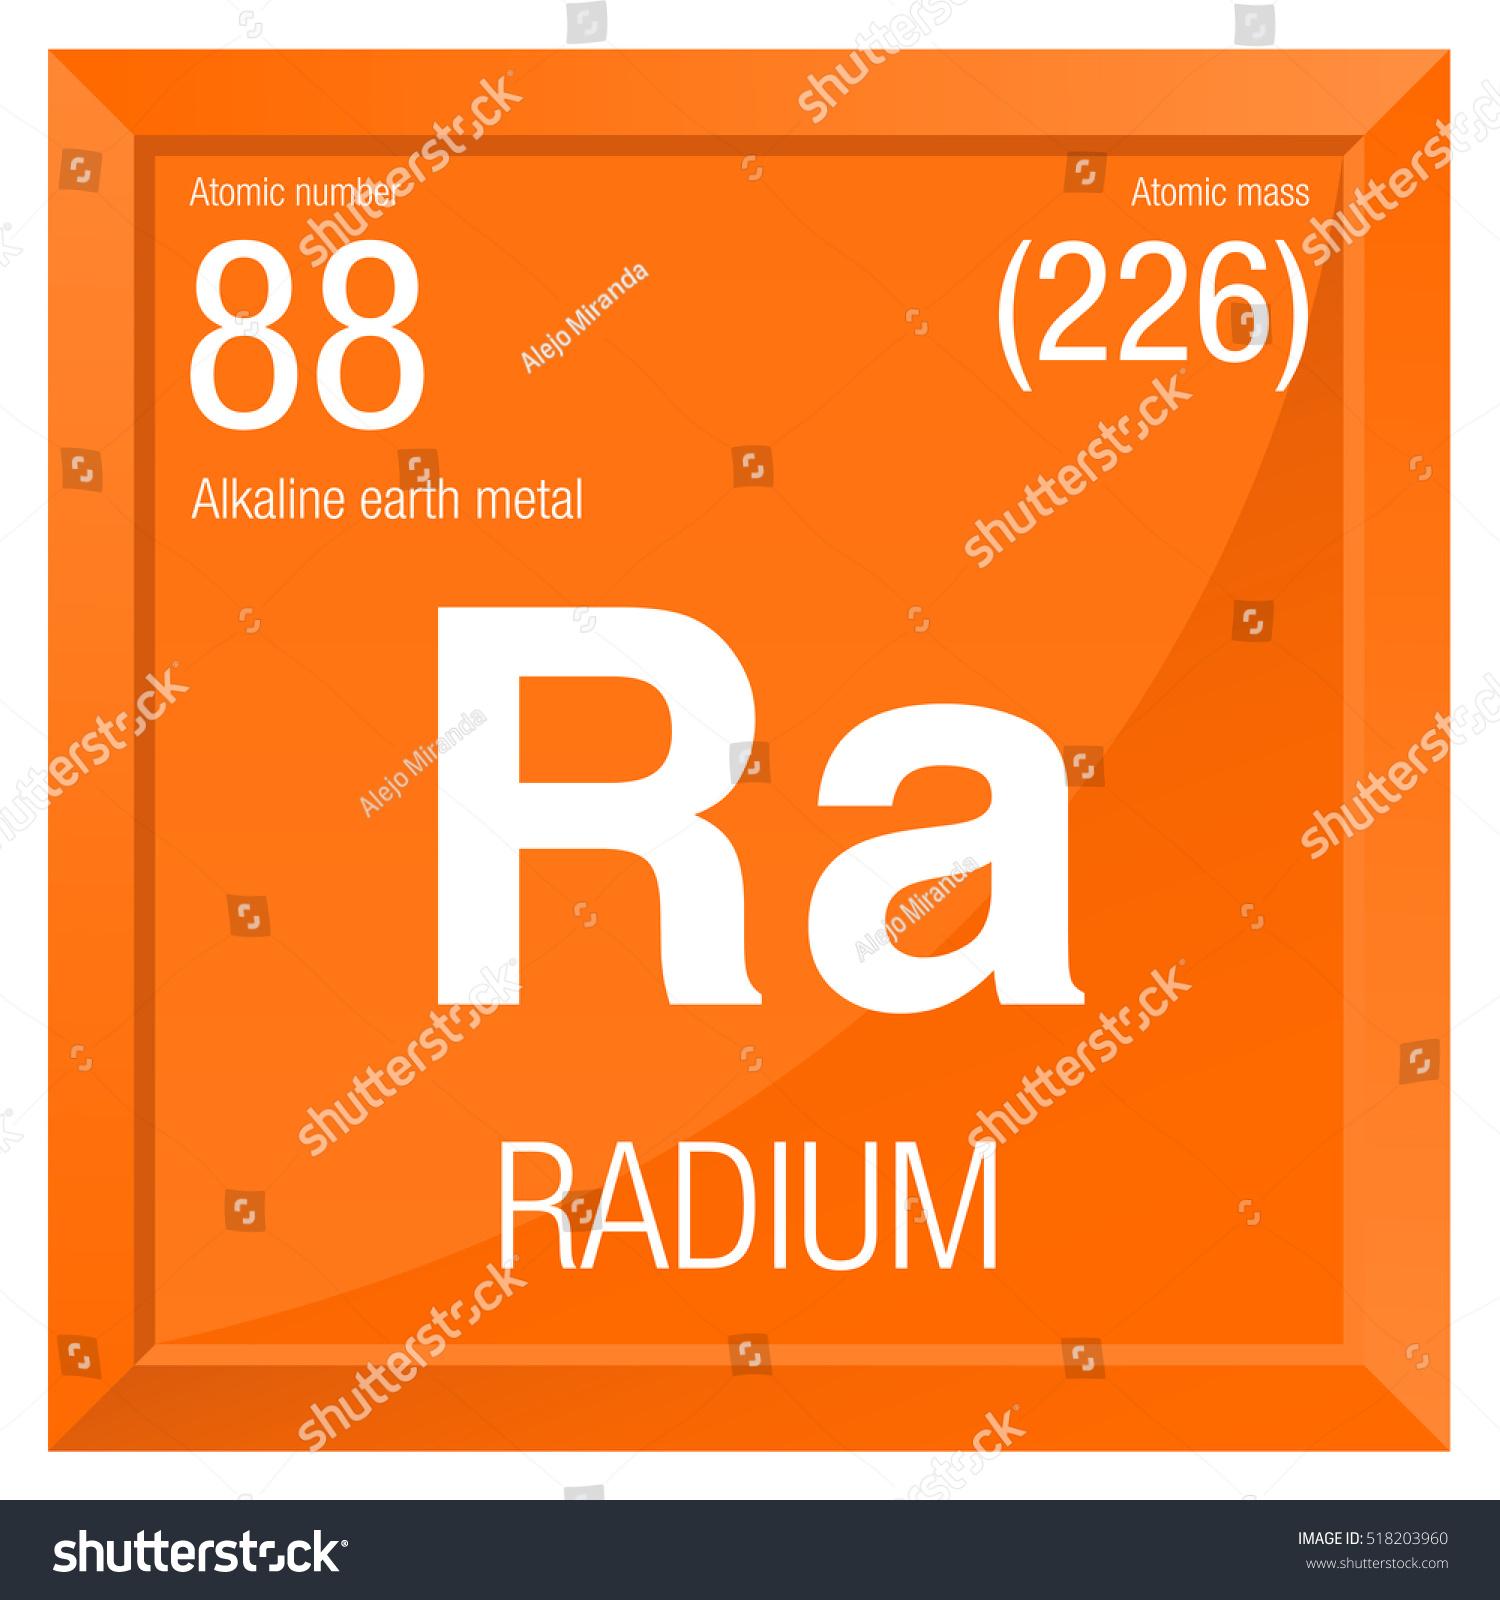 Radium symbol element number 88 periodic stock vector 2018 radium symbol element number 88 of the periodic table of the elements chemistry urtaz Choice Image